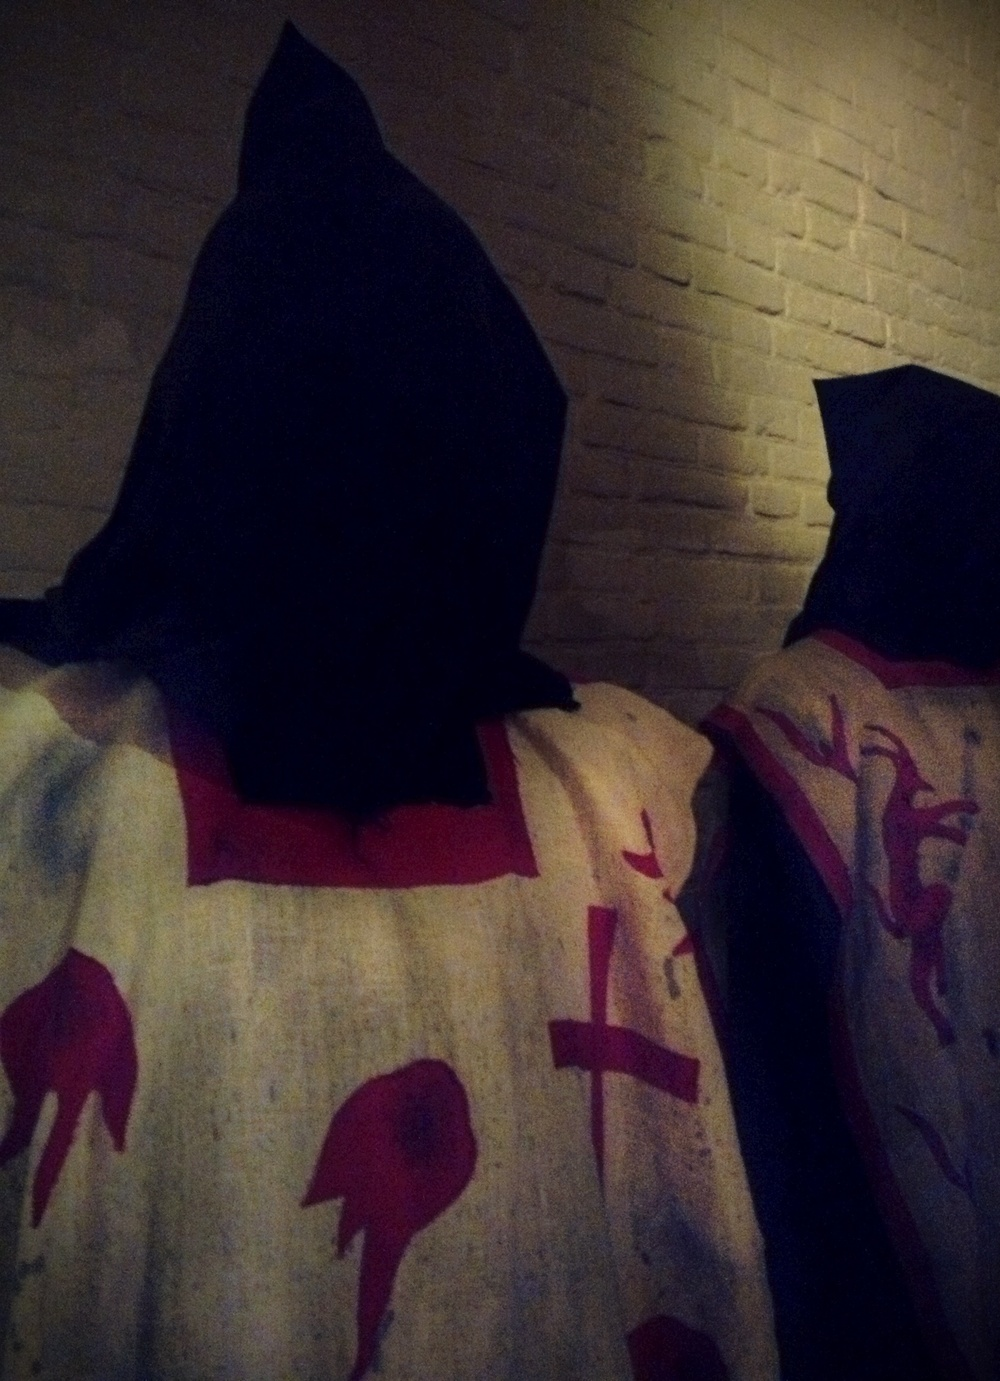 torture museum 1.jpg